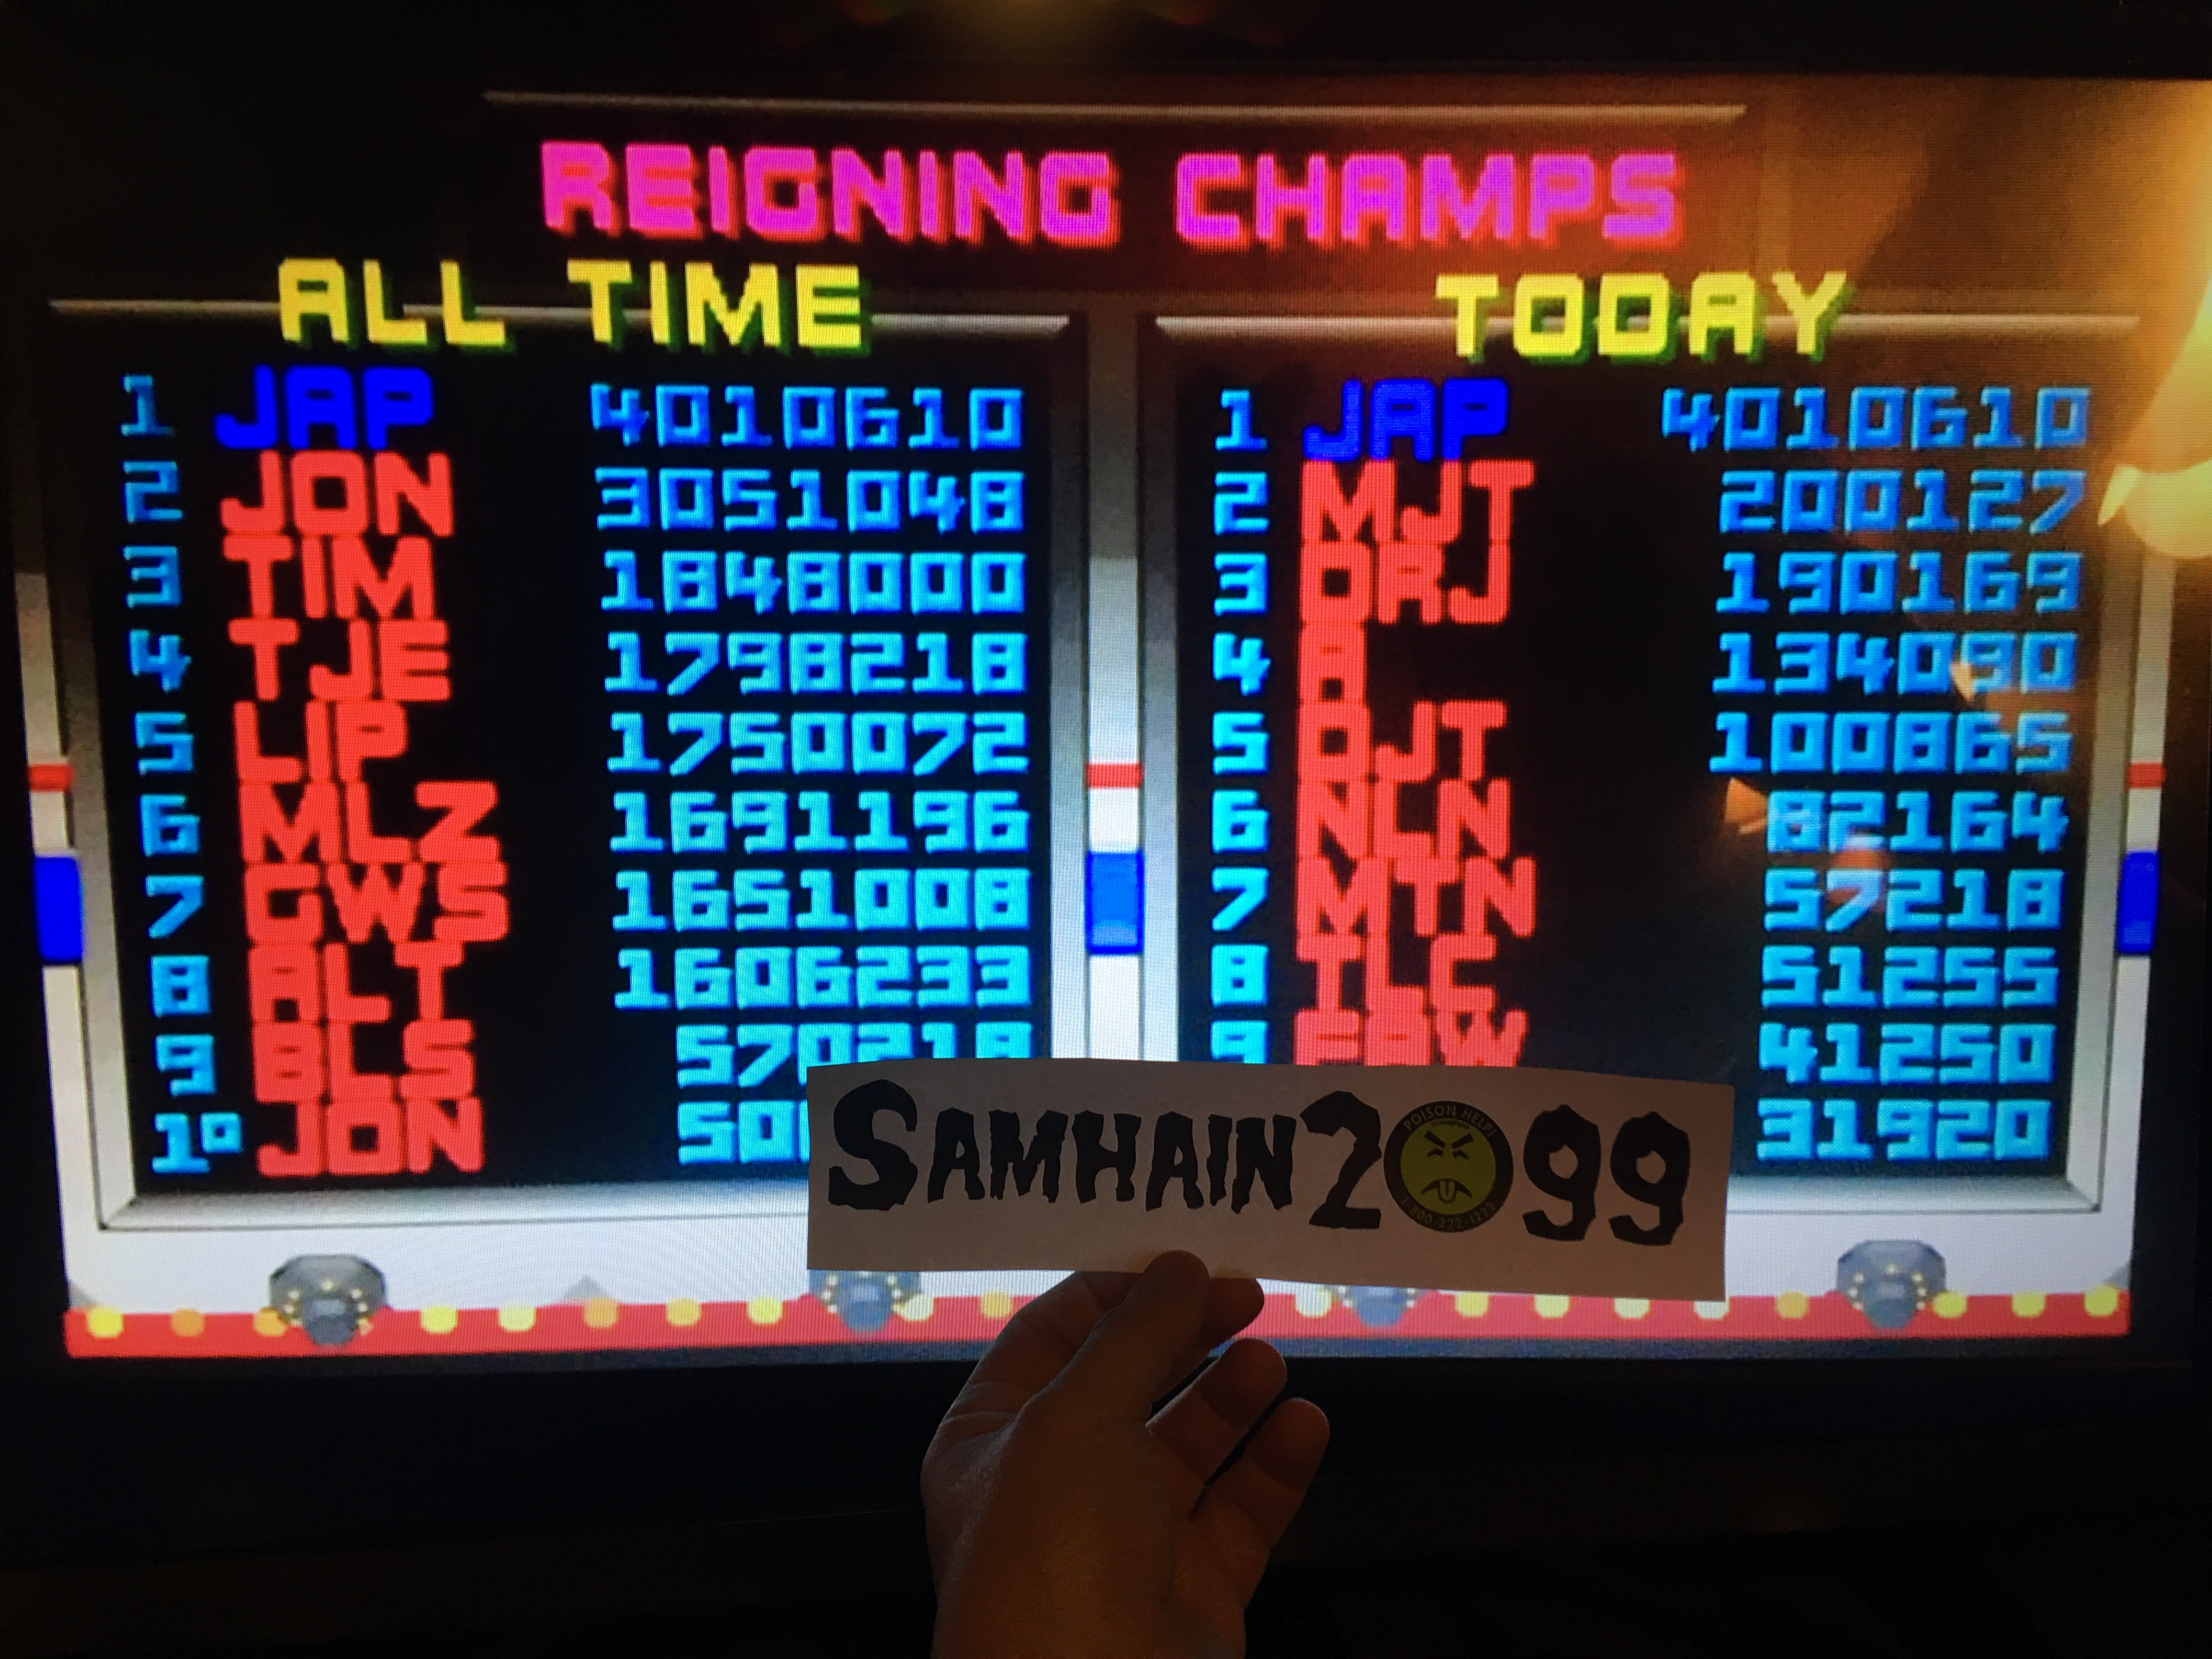 Samhain2099: Smash TV (Arcade Emulated / M.A.M.E.) 4,010,610 points on 2017-01-27 22:47:28